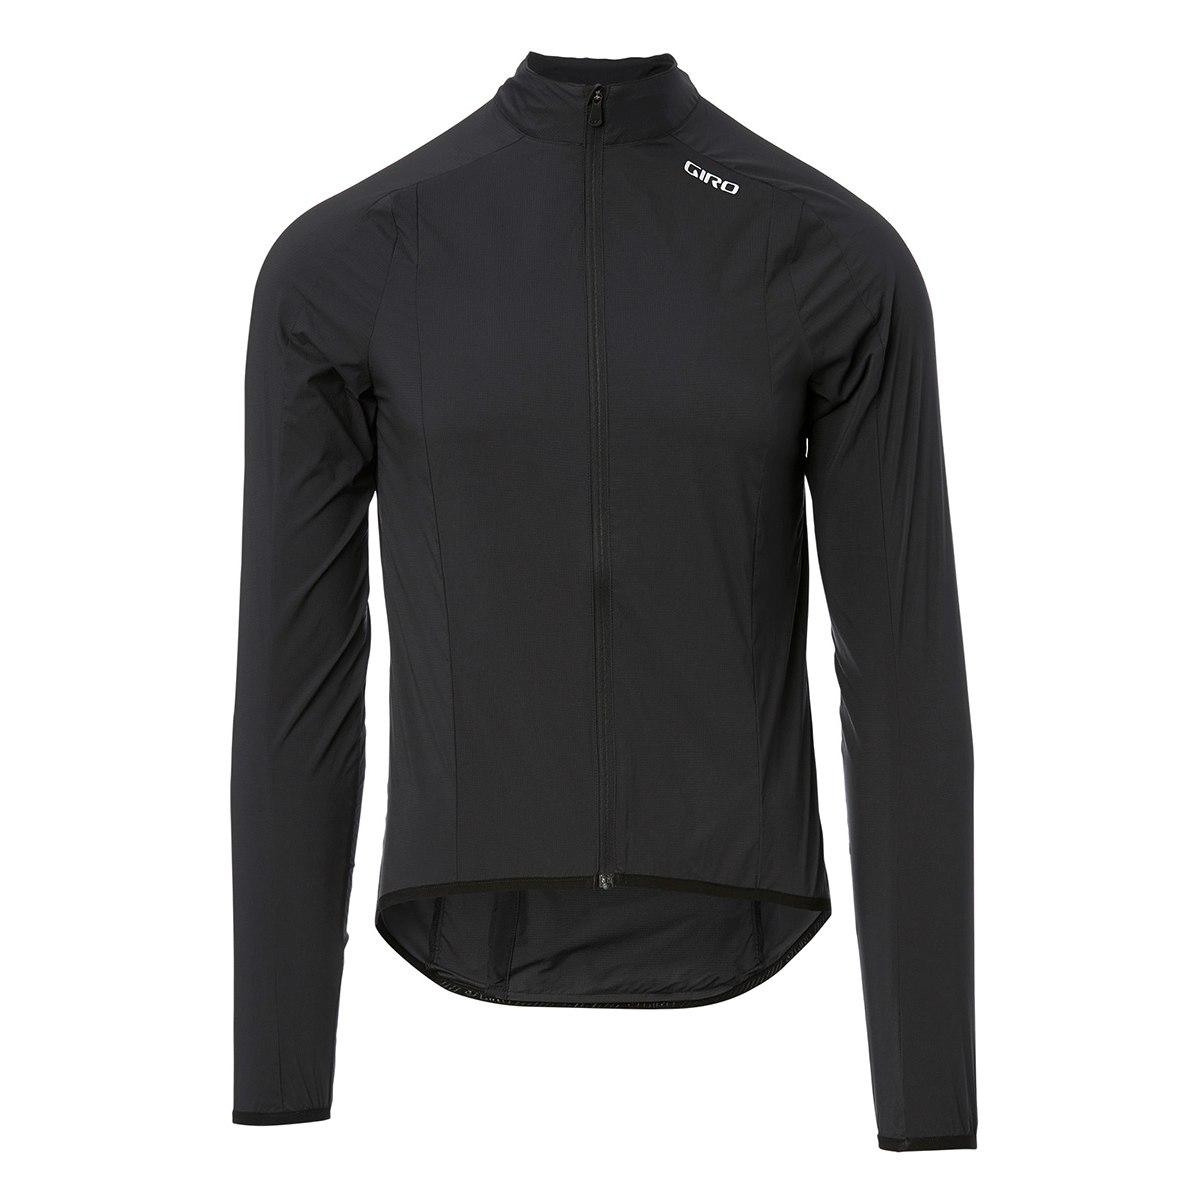 Giro Chrono Expert Wind Jacket - black